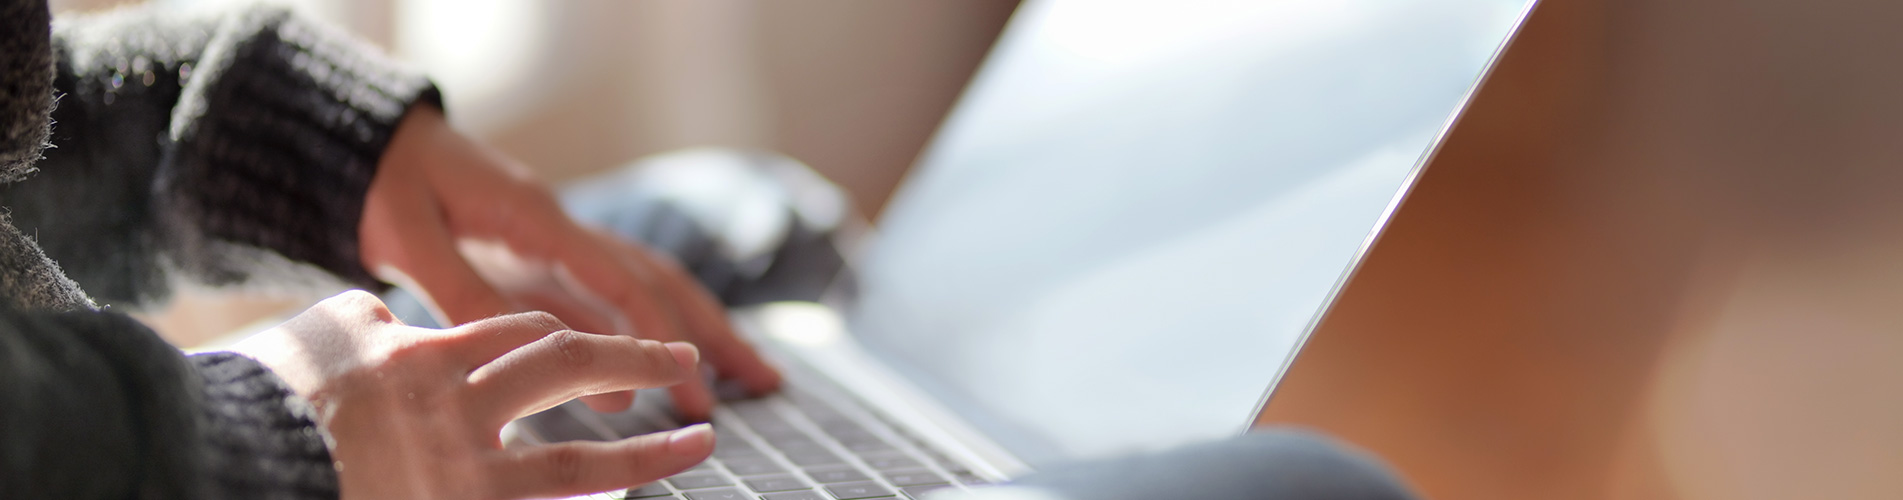 Comment estimer son bien immobilier en ligne - BienEstimer by SAFTI